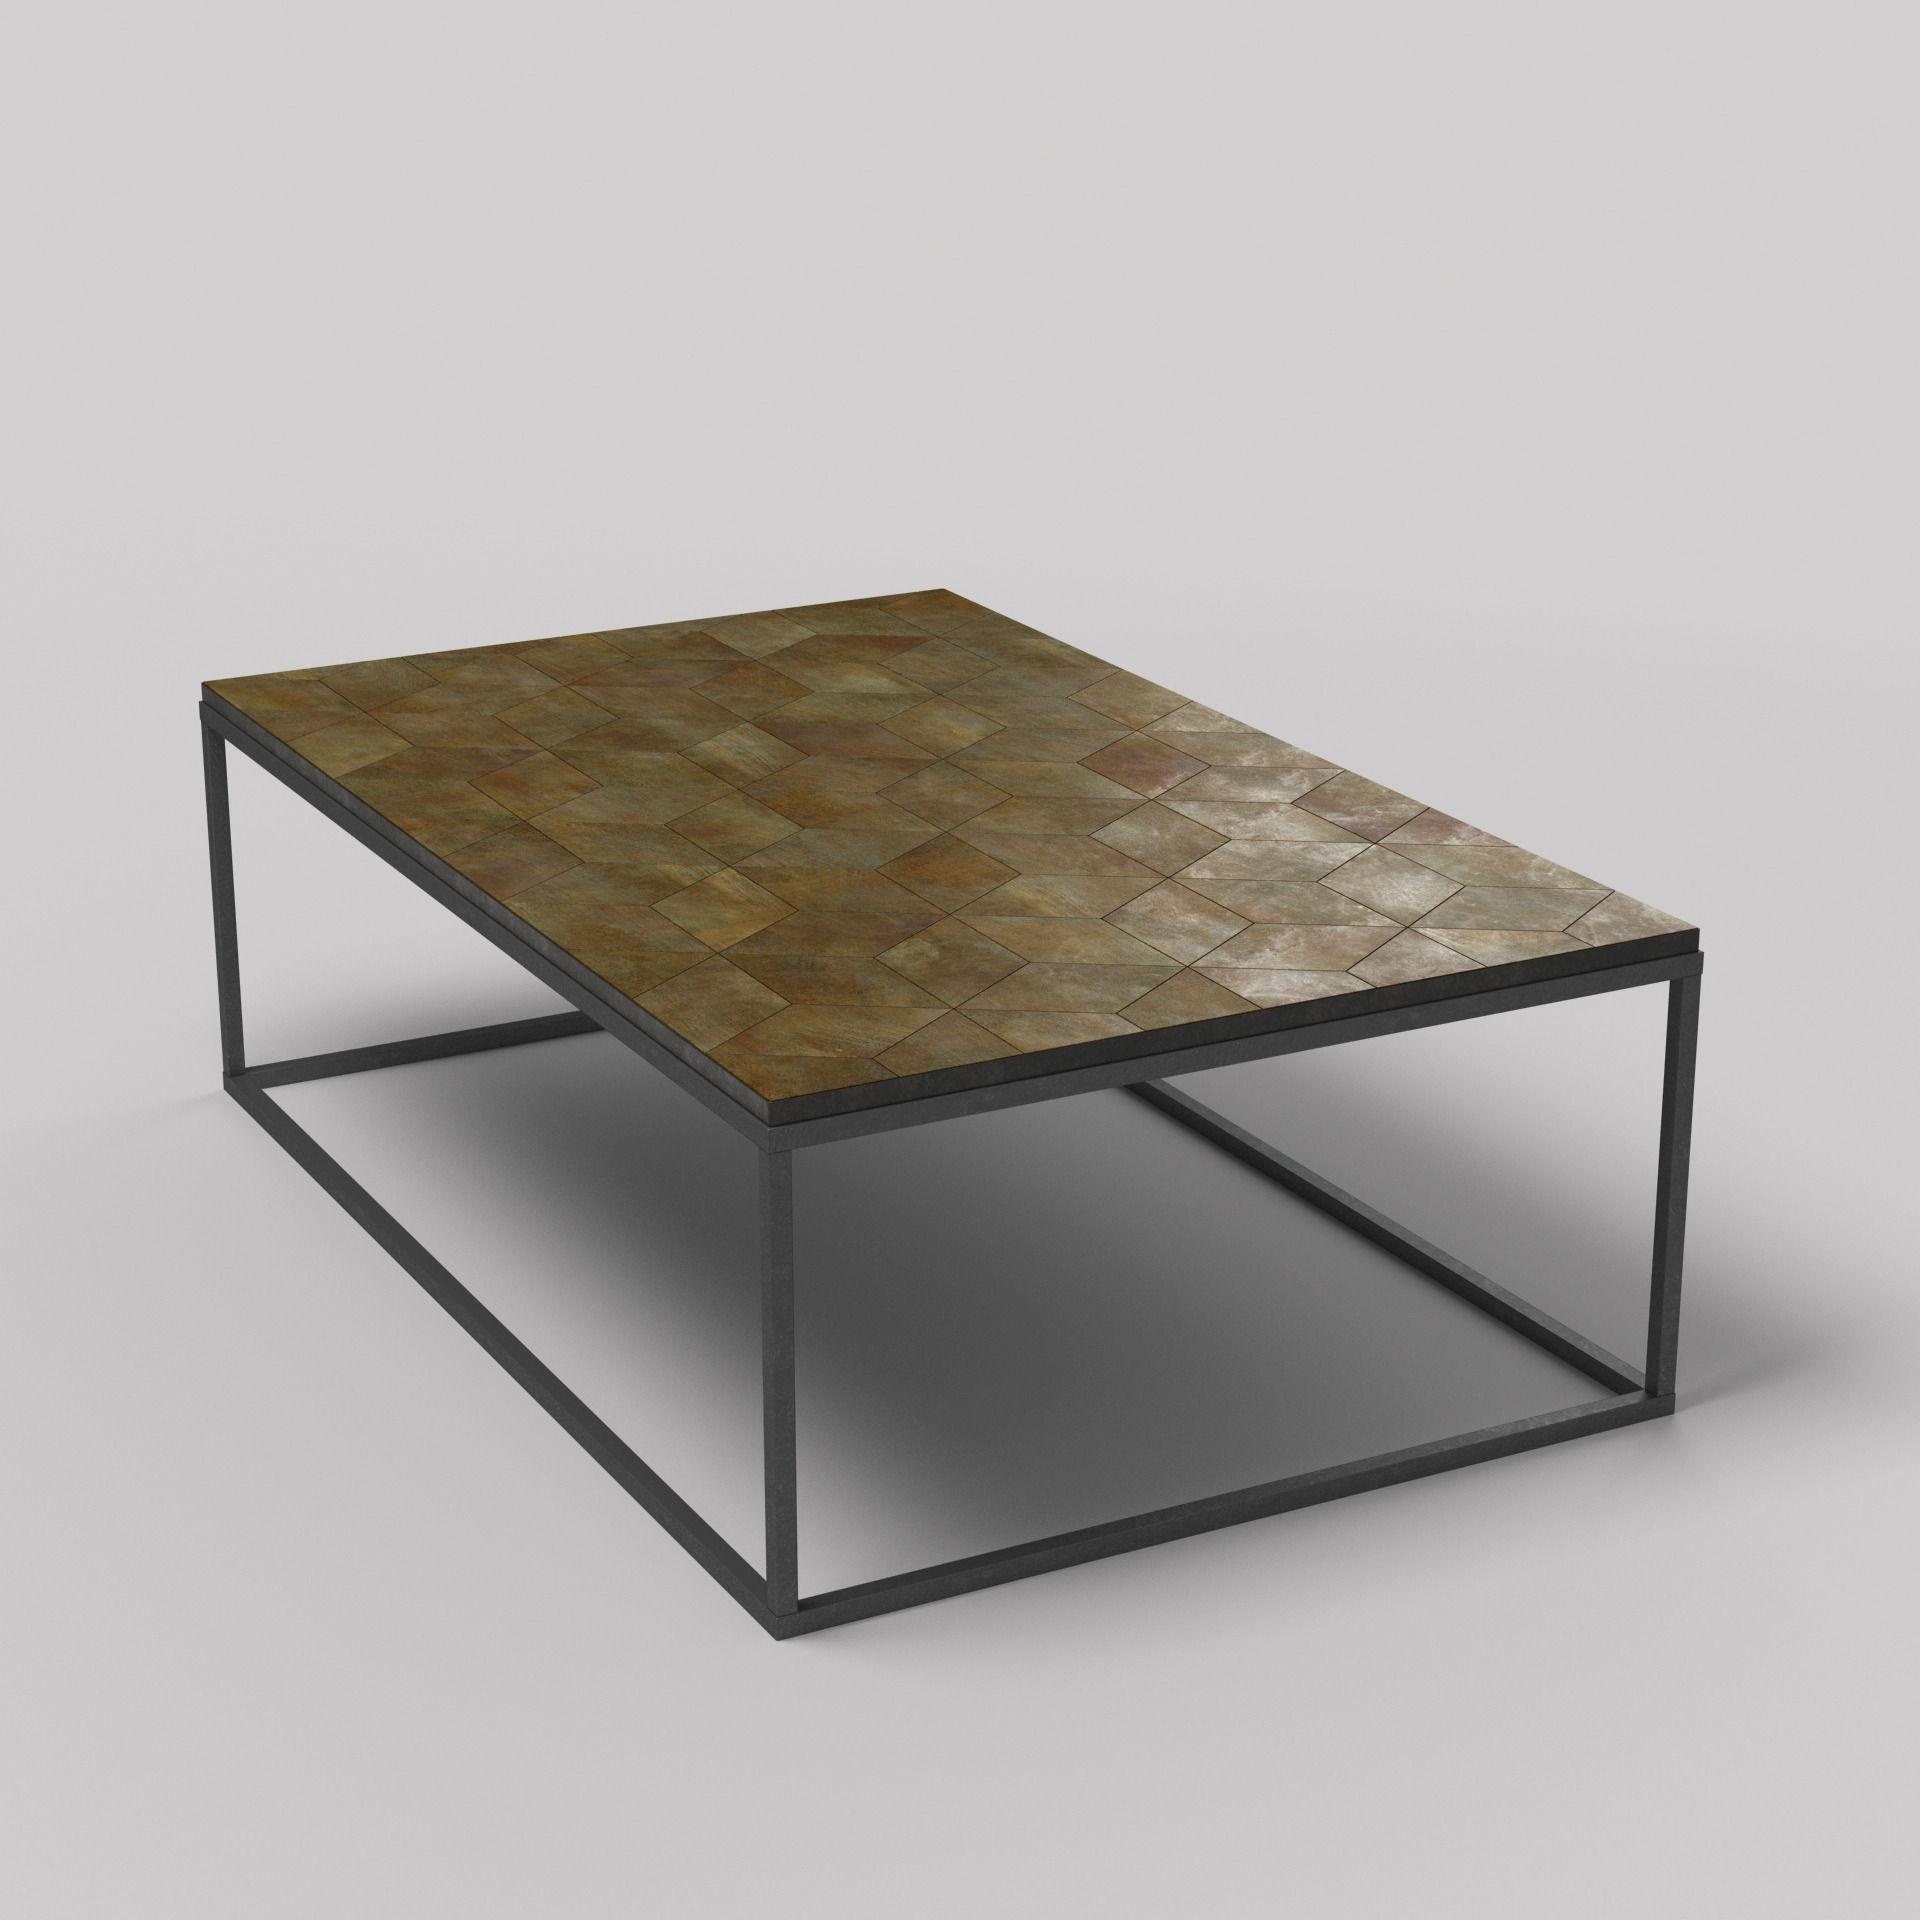 metal coffee table 3d model high detailed photorealistic metal